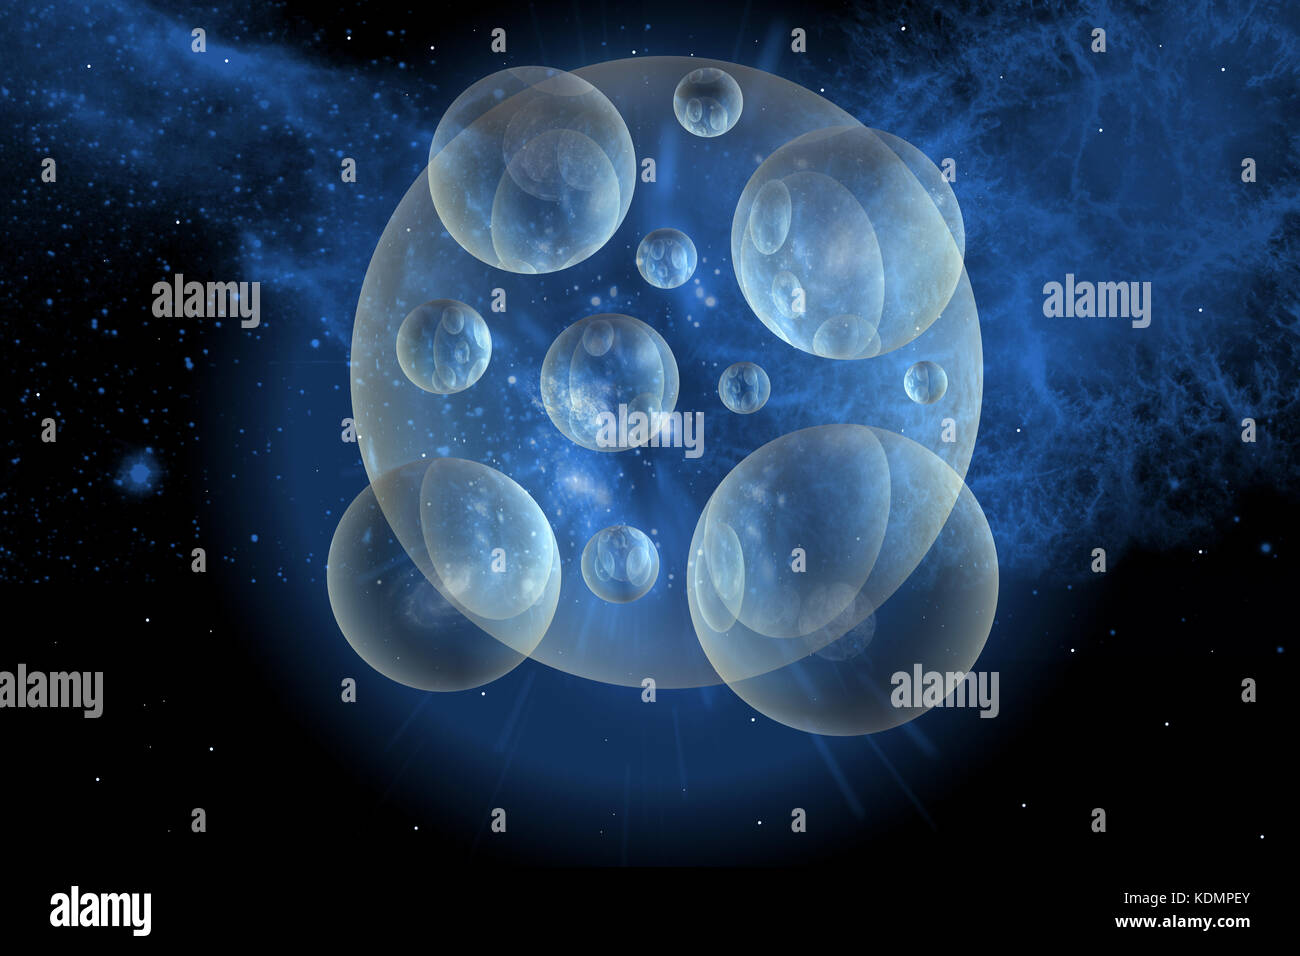 Multidimensional Universes - Stock Image